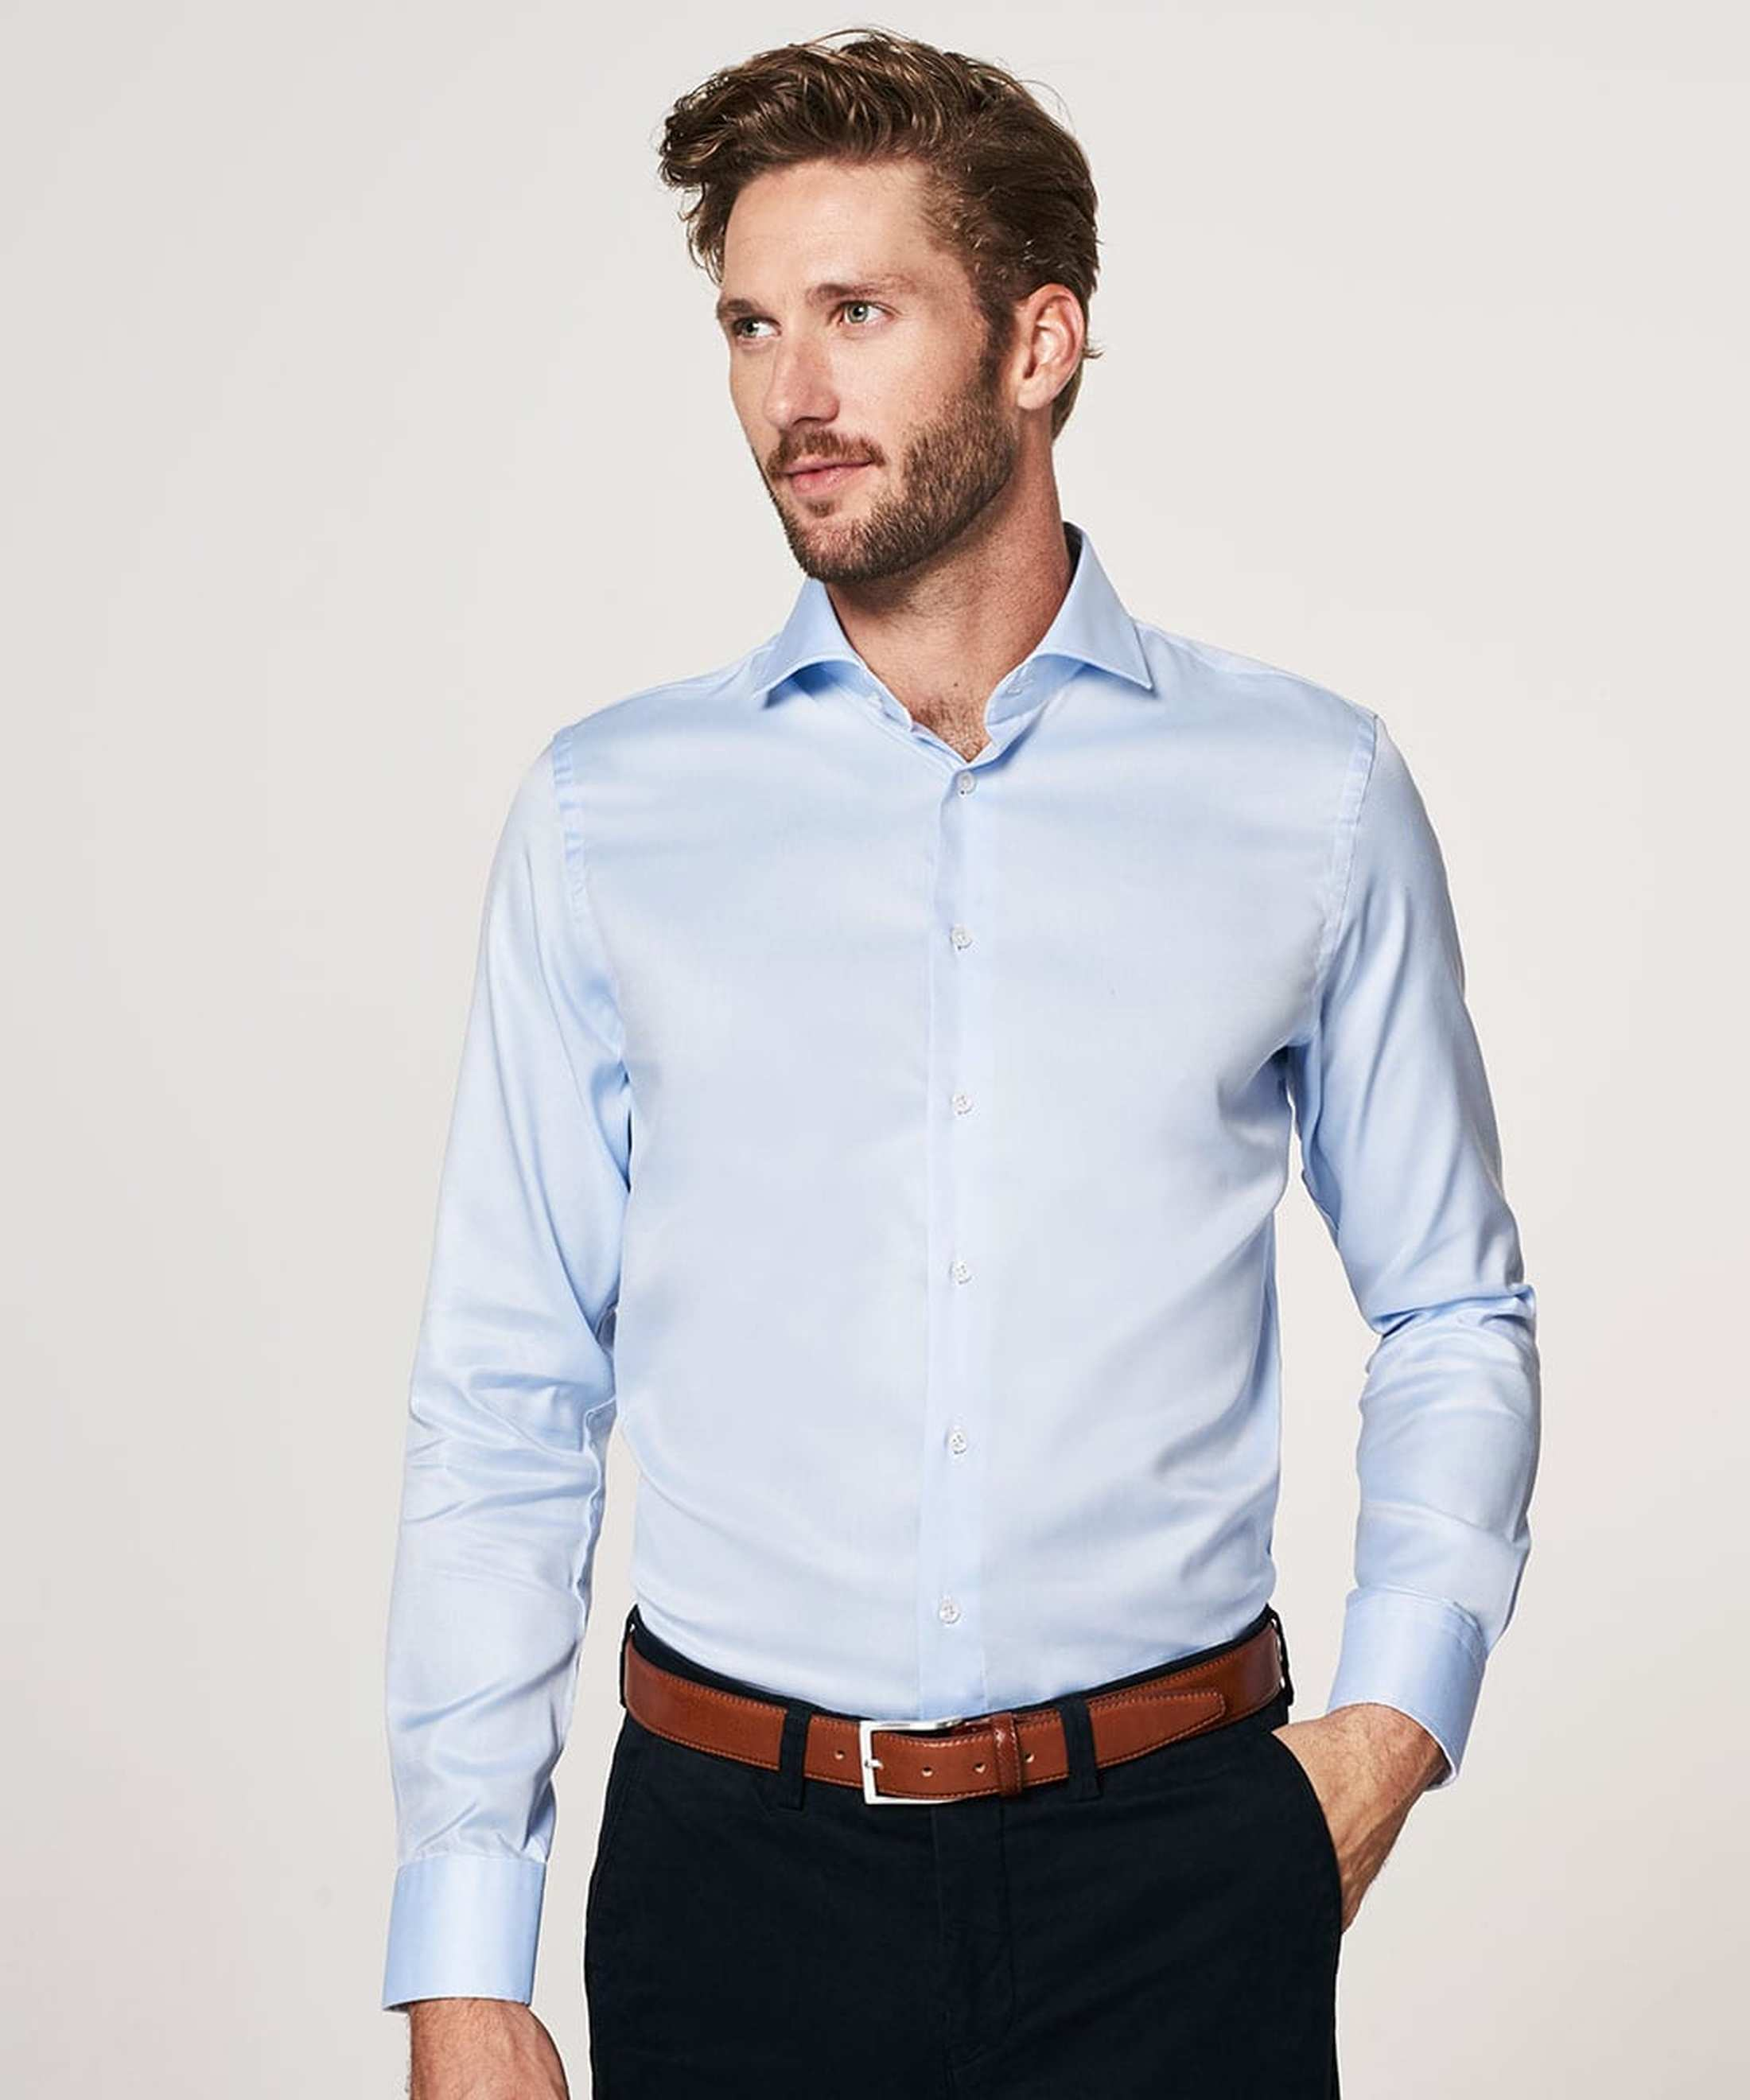 Profuomo shirt Blue + White Contrast foto 3